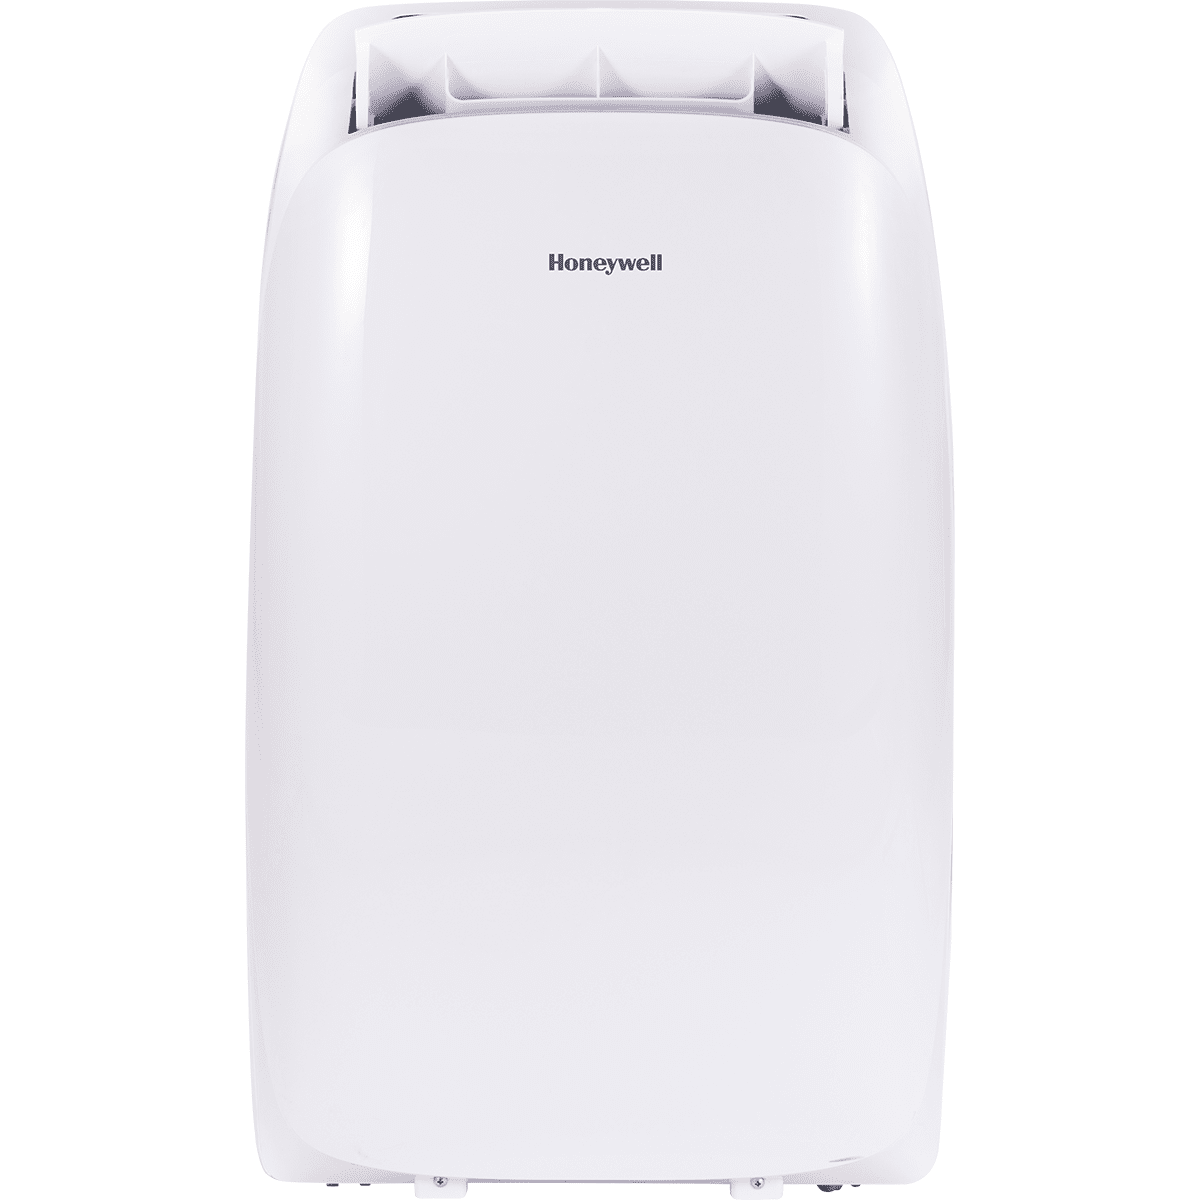 Honeywell 14,000 BTU Portable Air Conditioner w/ Heat